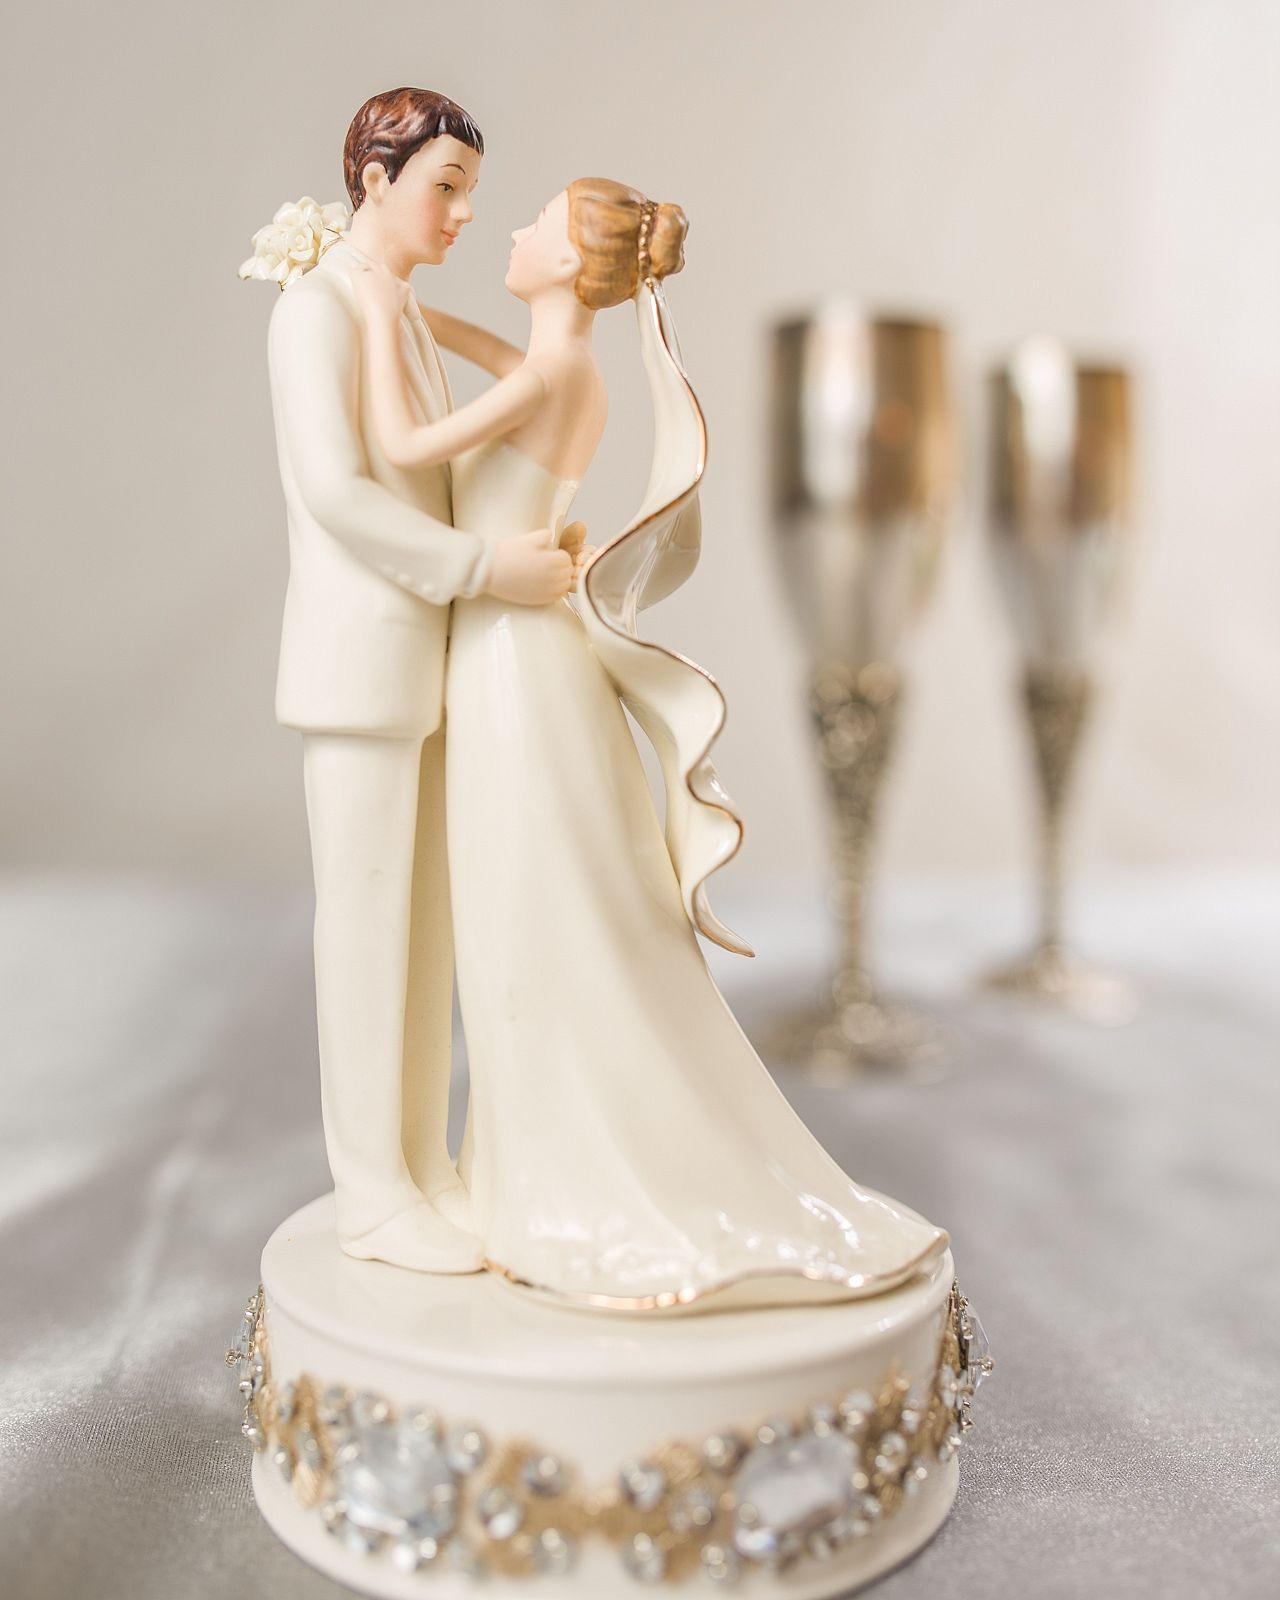 White Wedding Cake Topper  Glam f White Porcelain Bride and Groom Wedding Cake